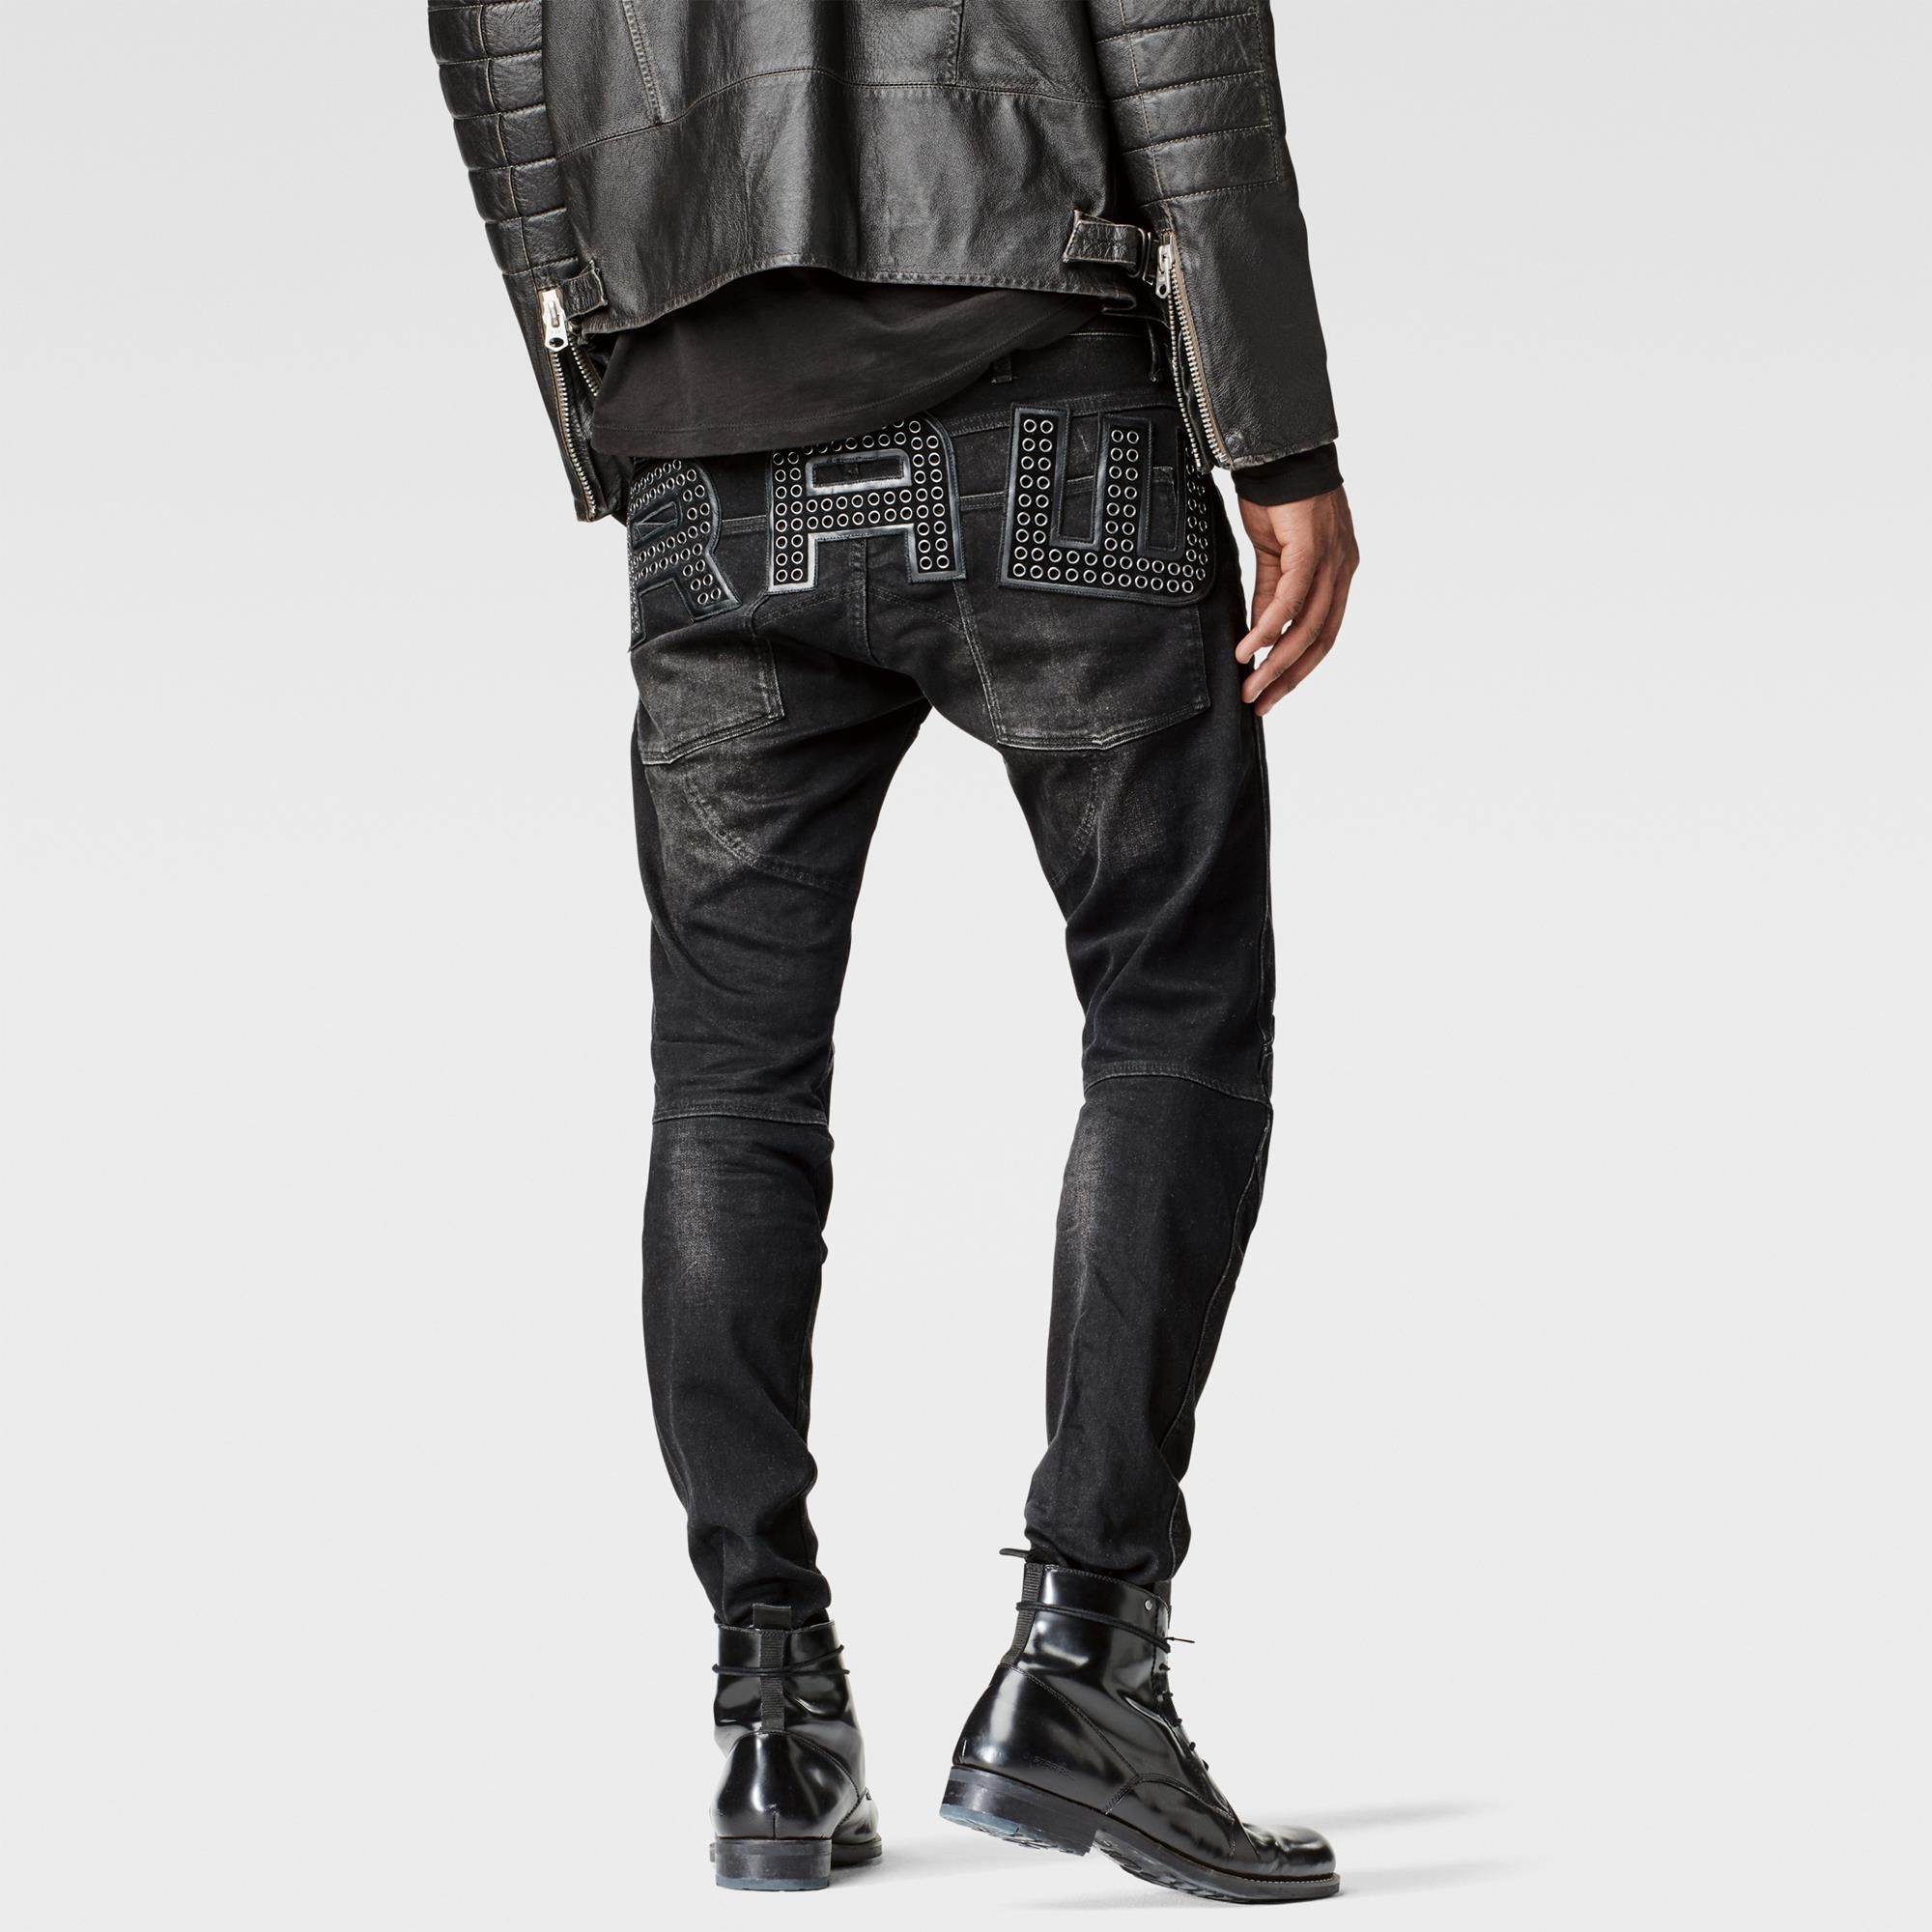 5f2858b5082 5620 G-Star Elwood 3D Slim Jeans | Pants | Slim jeans, Jeans, Raw jeans